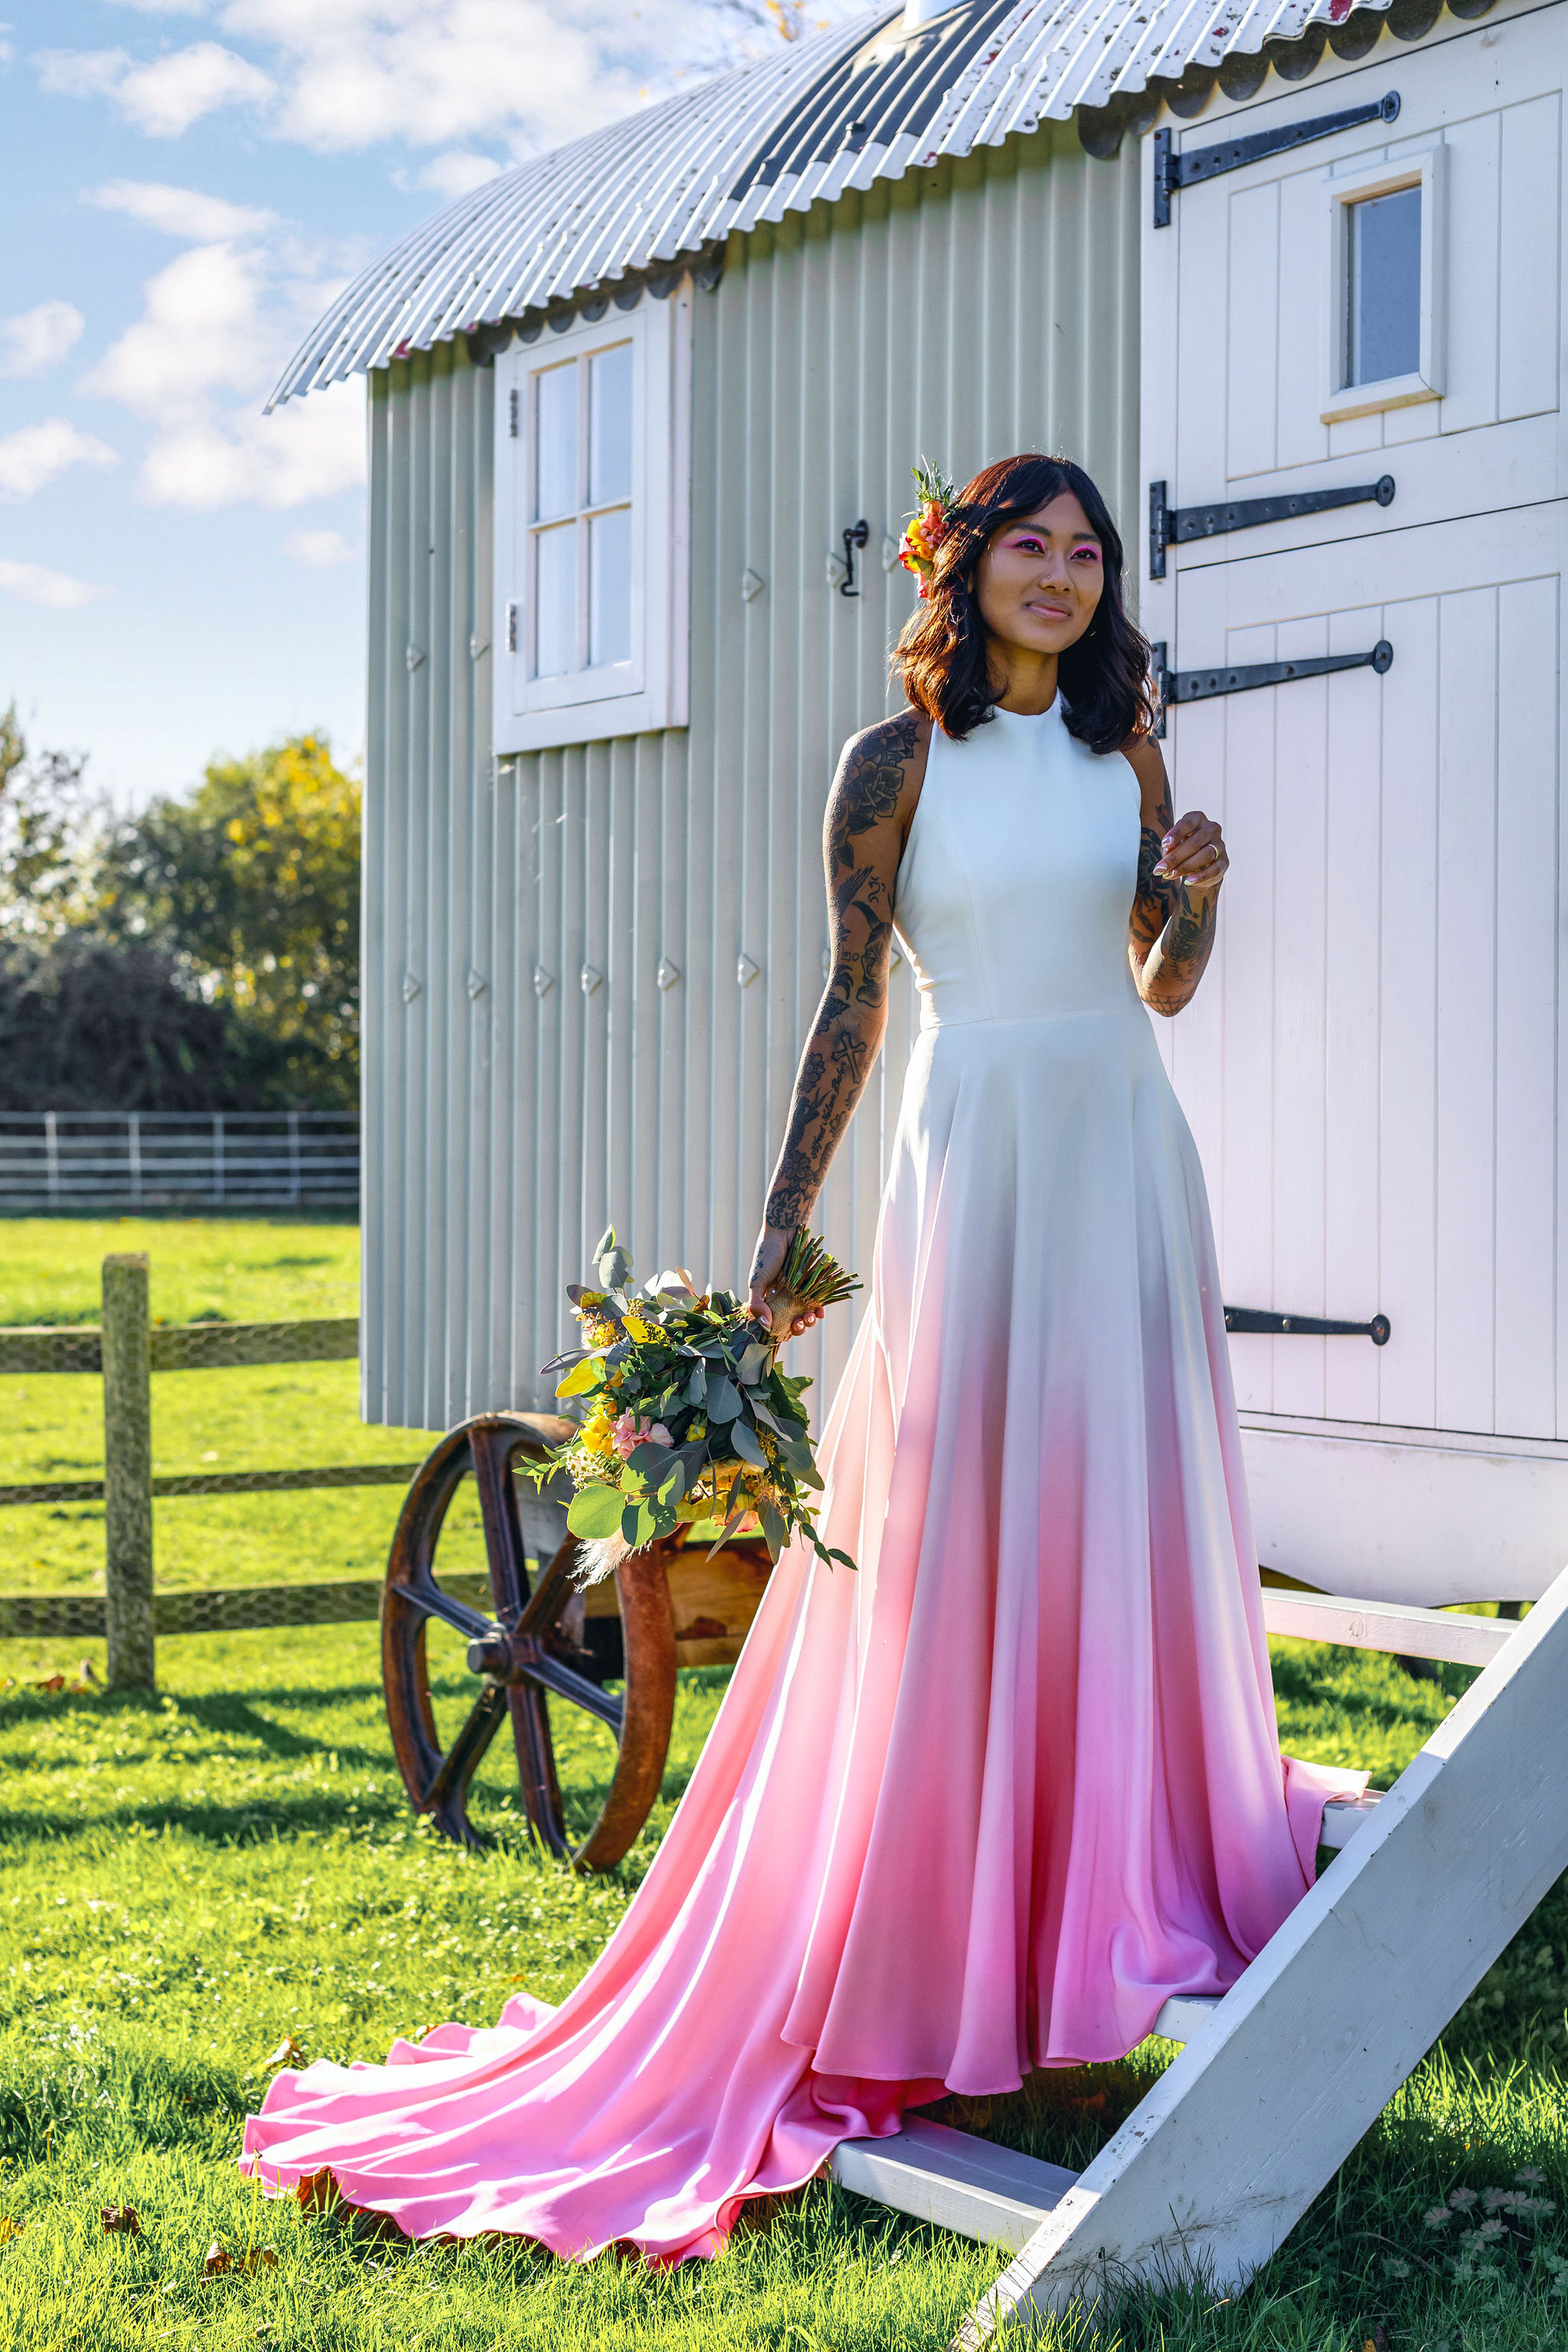 Favourite Lucy Can't Dance unique alternative wedding dress blog - peaches new bridalwear range 1 - pink ombre wedding dress